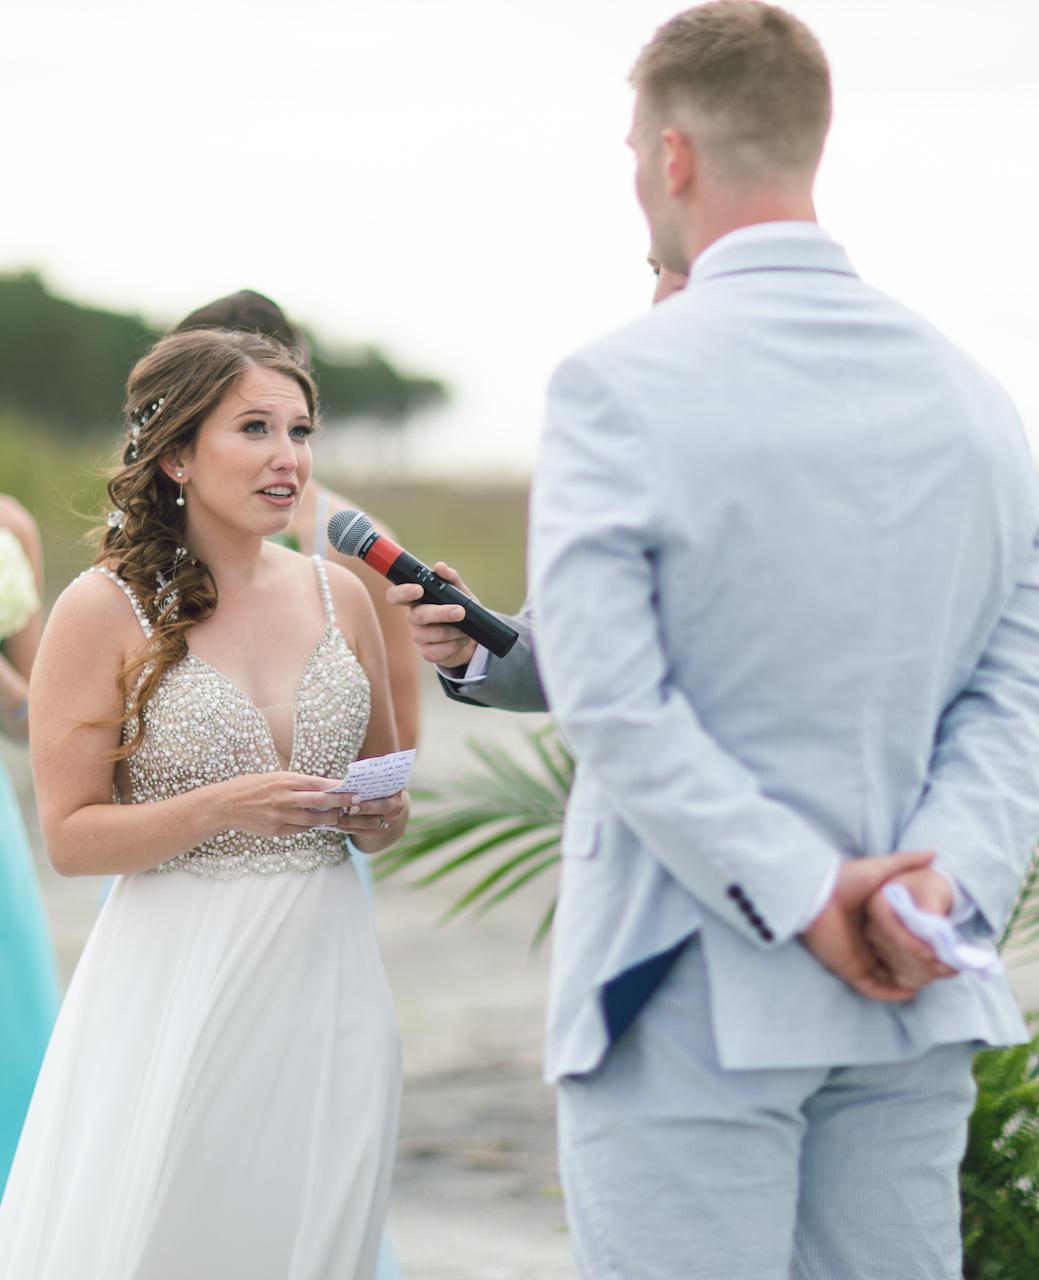 hilton-head-island-wedding-sc-ceremony94.jpg